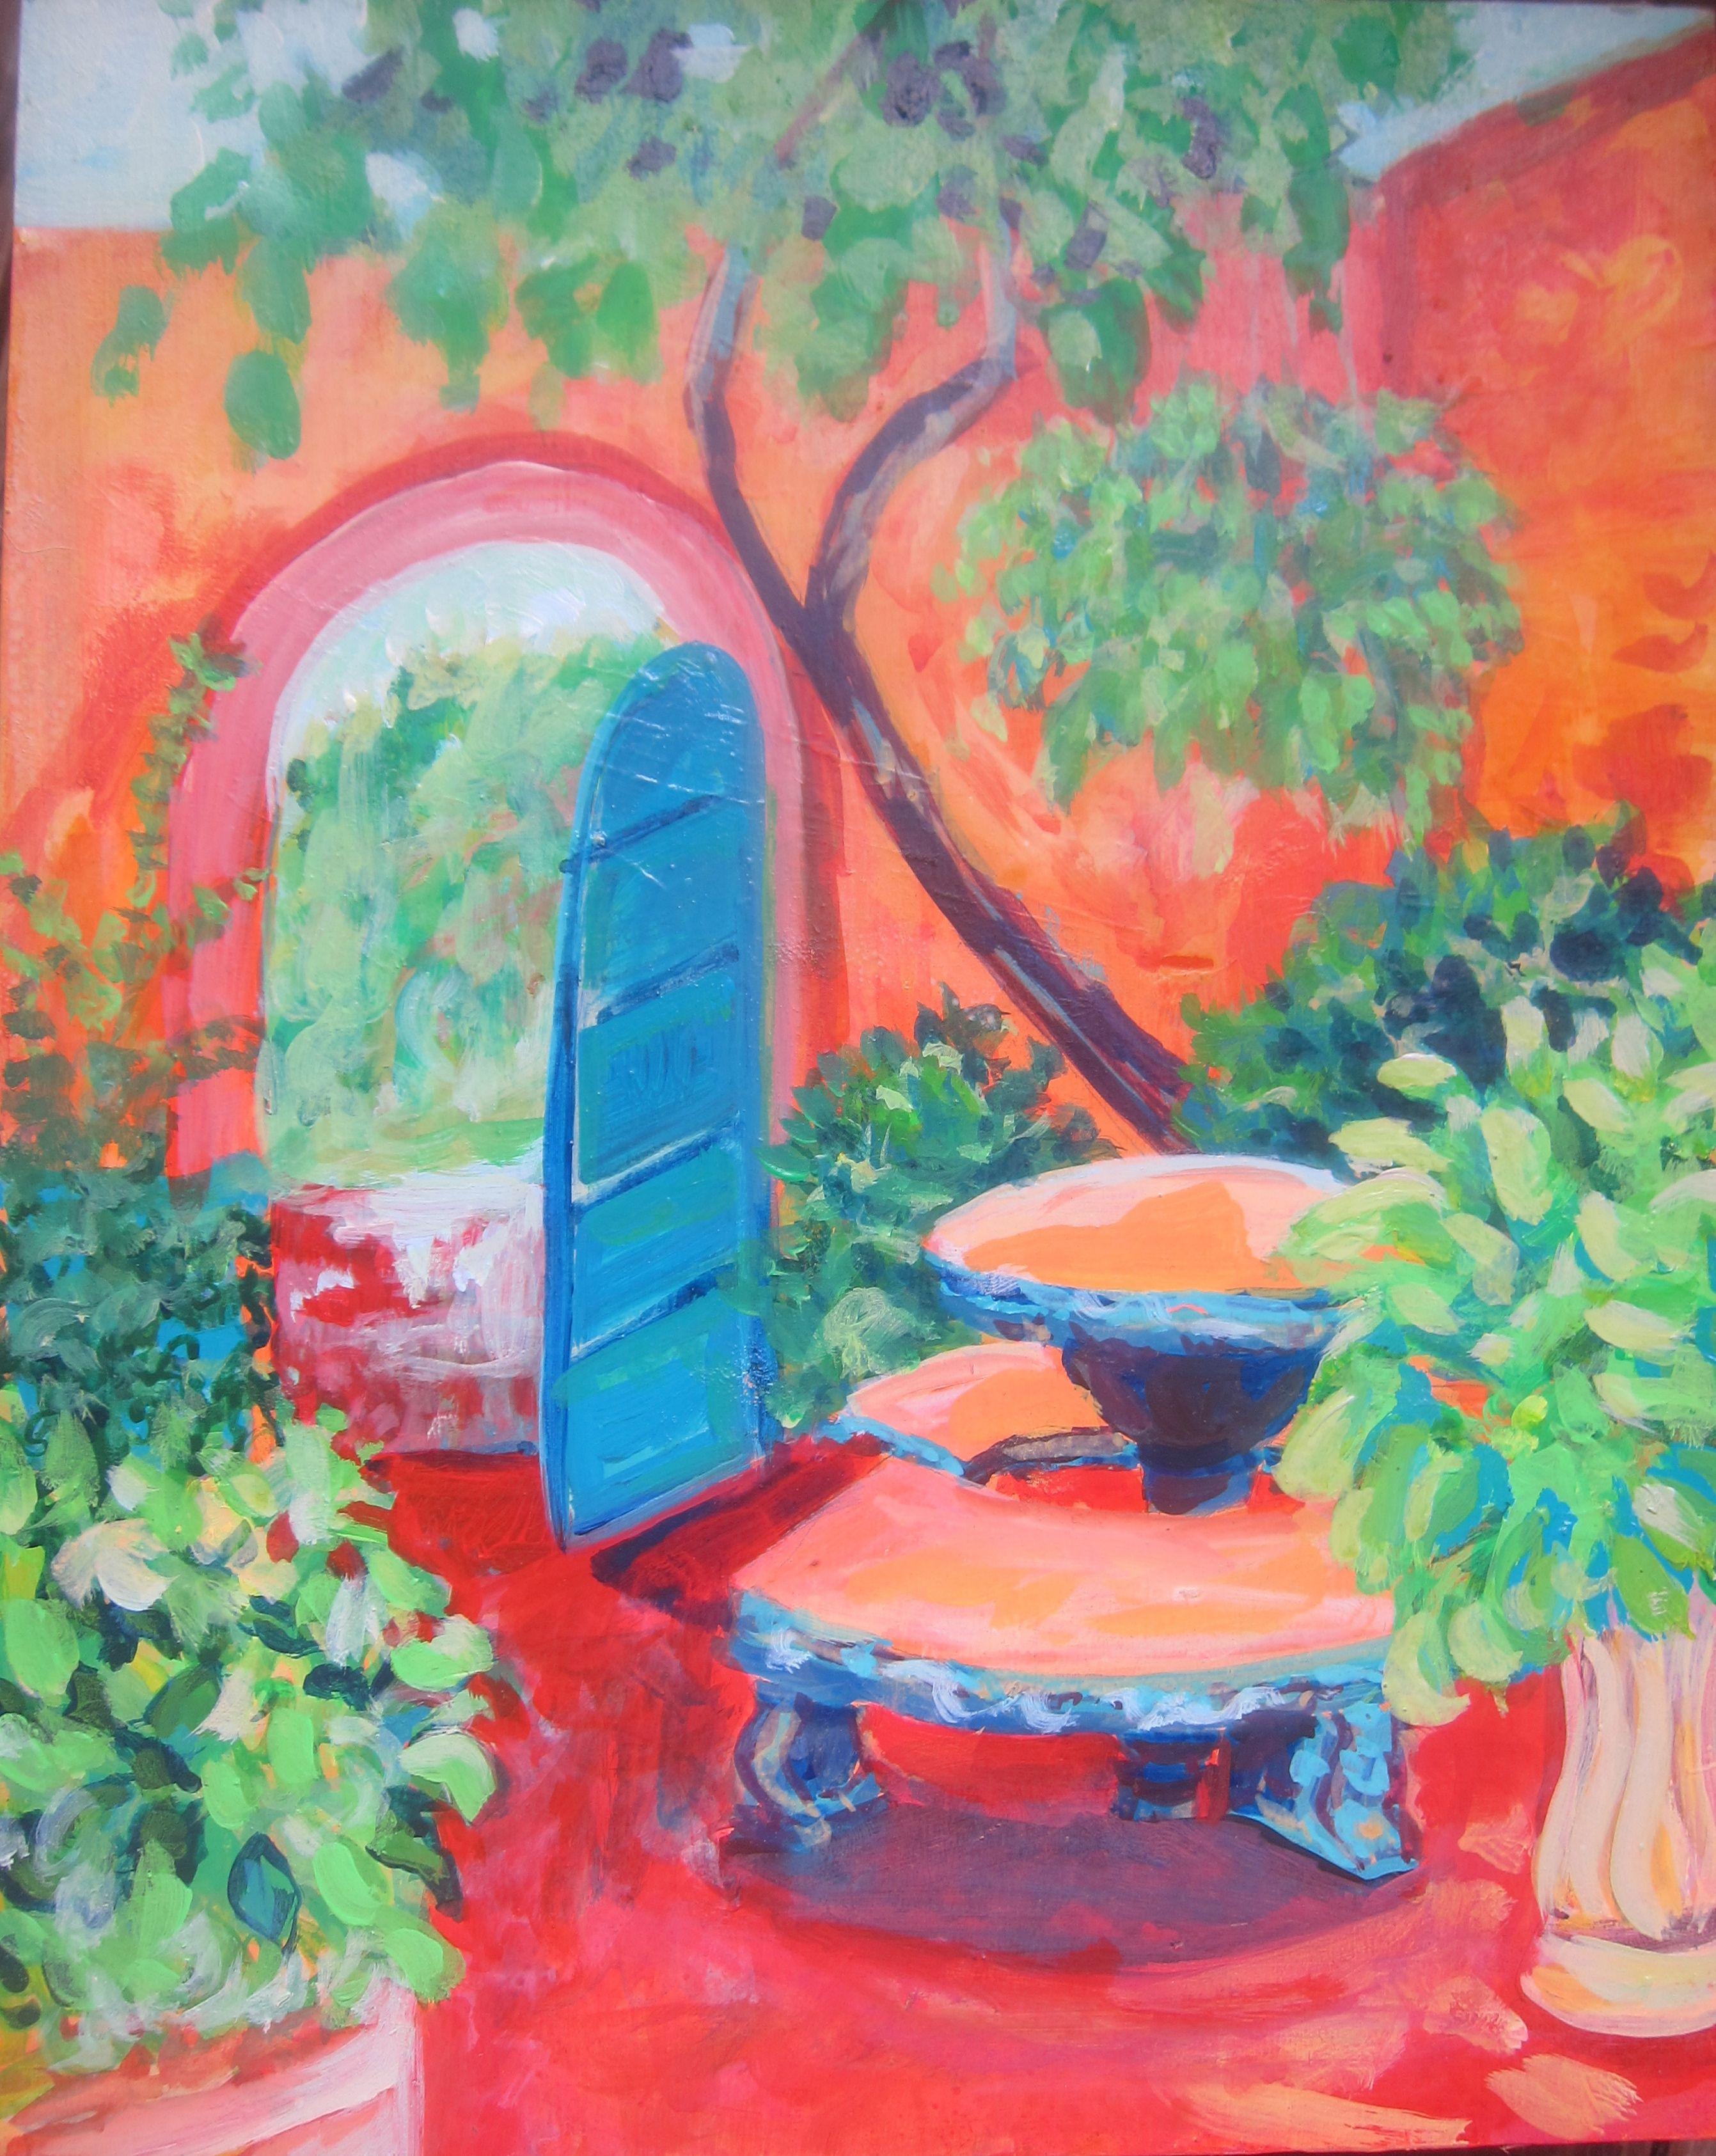 Painting By Trinidadian Artist Danielle Du Boulay